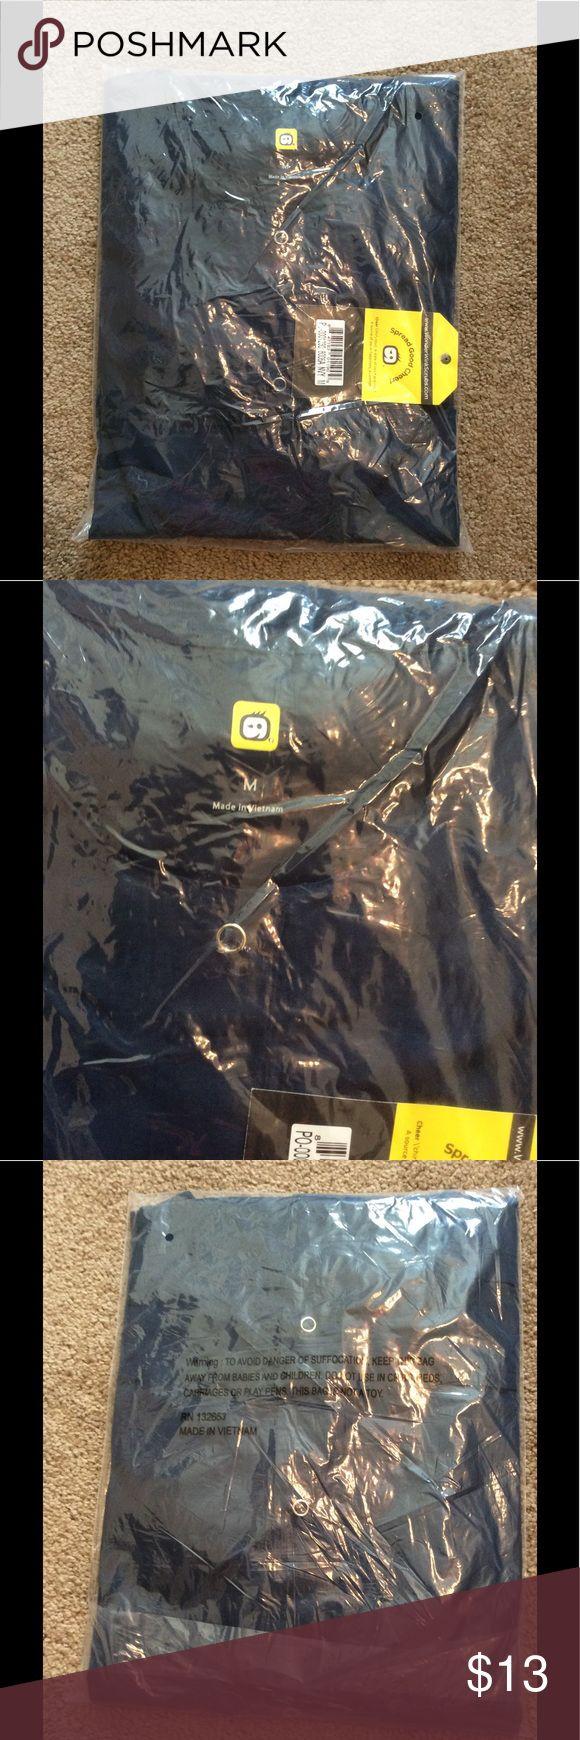 NWT Navy Scrub Jacket NWT Navy Scrub Jacket, Size Medium, New in package wonderwink scrubs Jackets & Coats